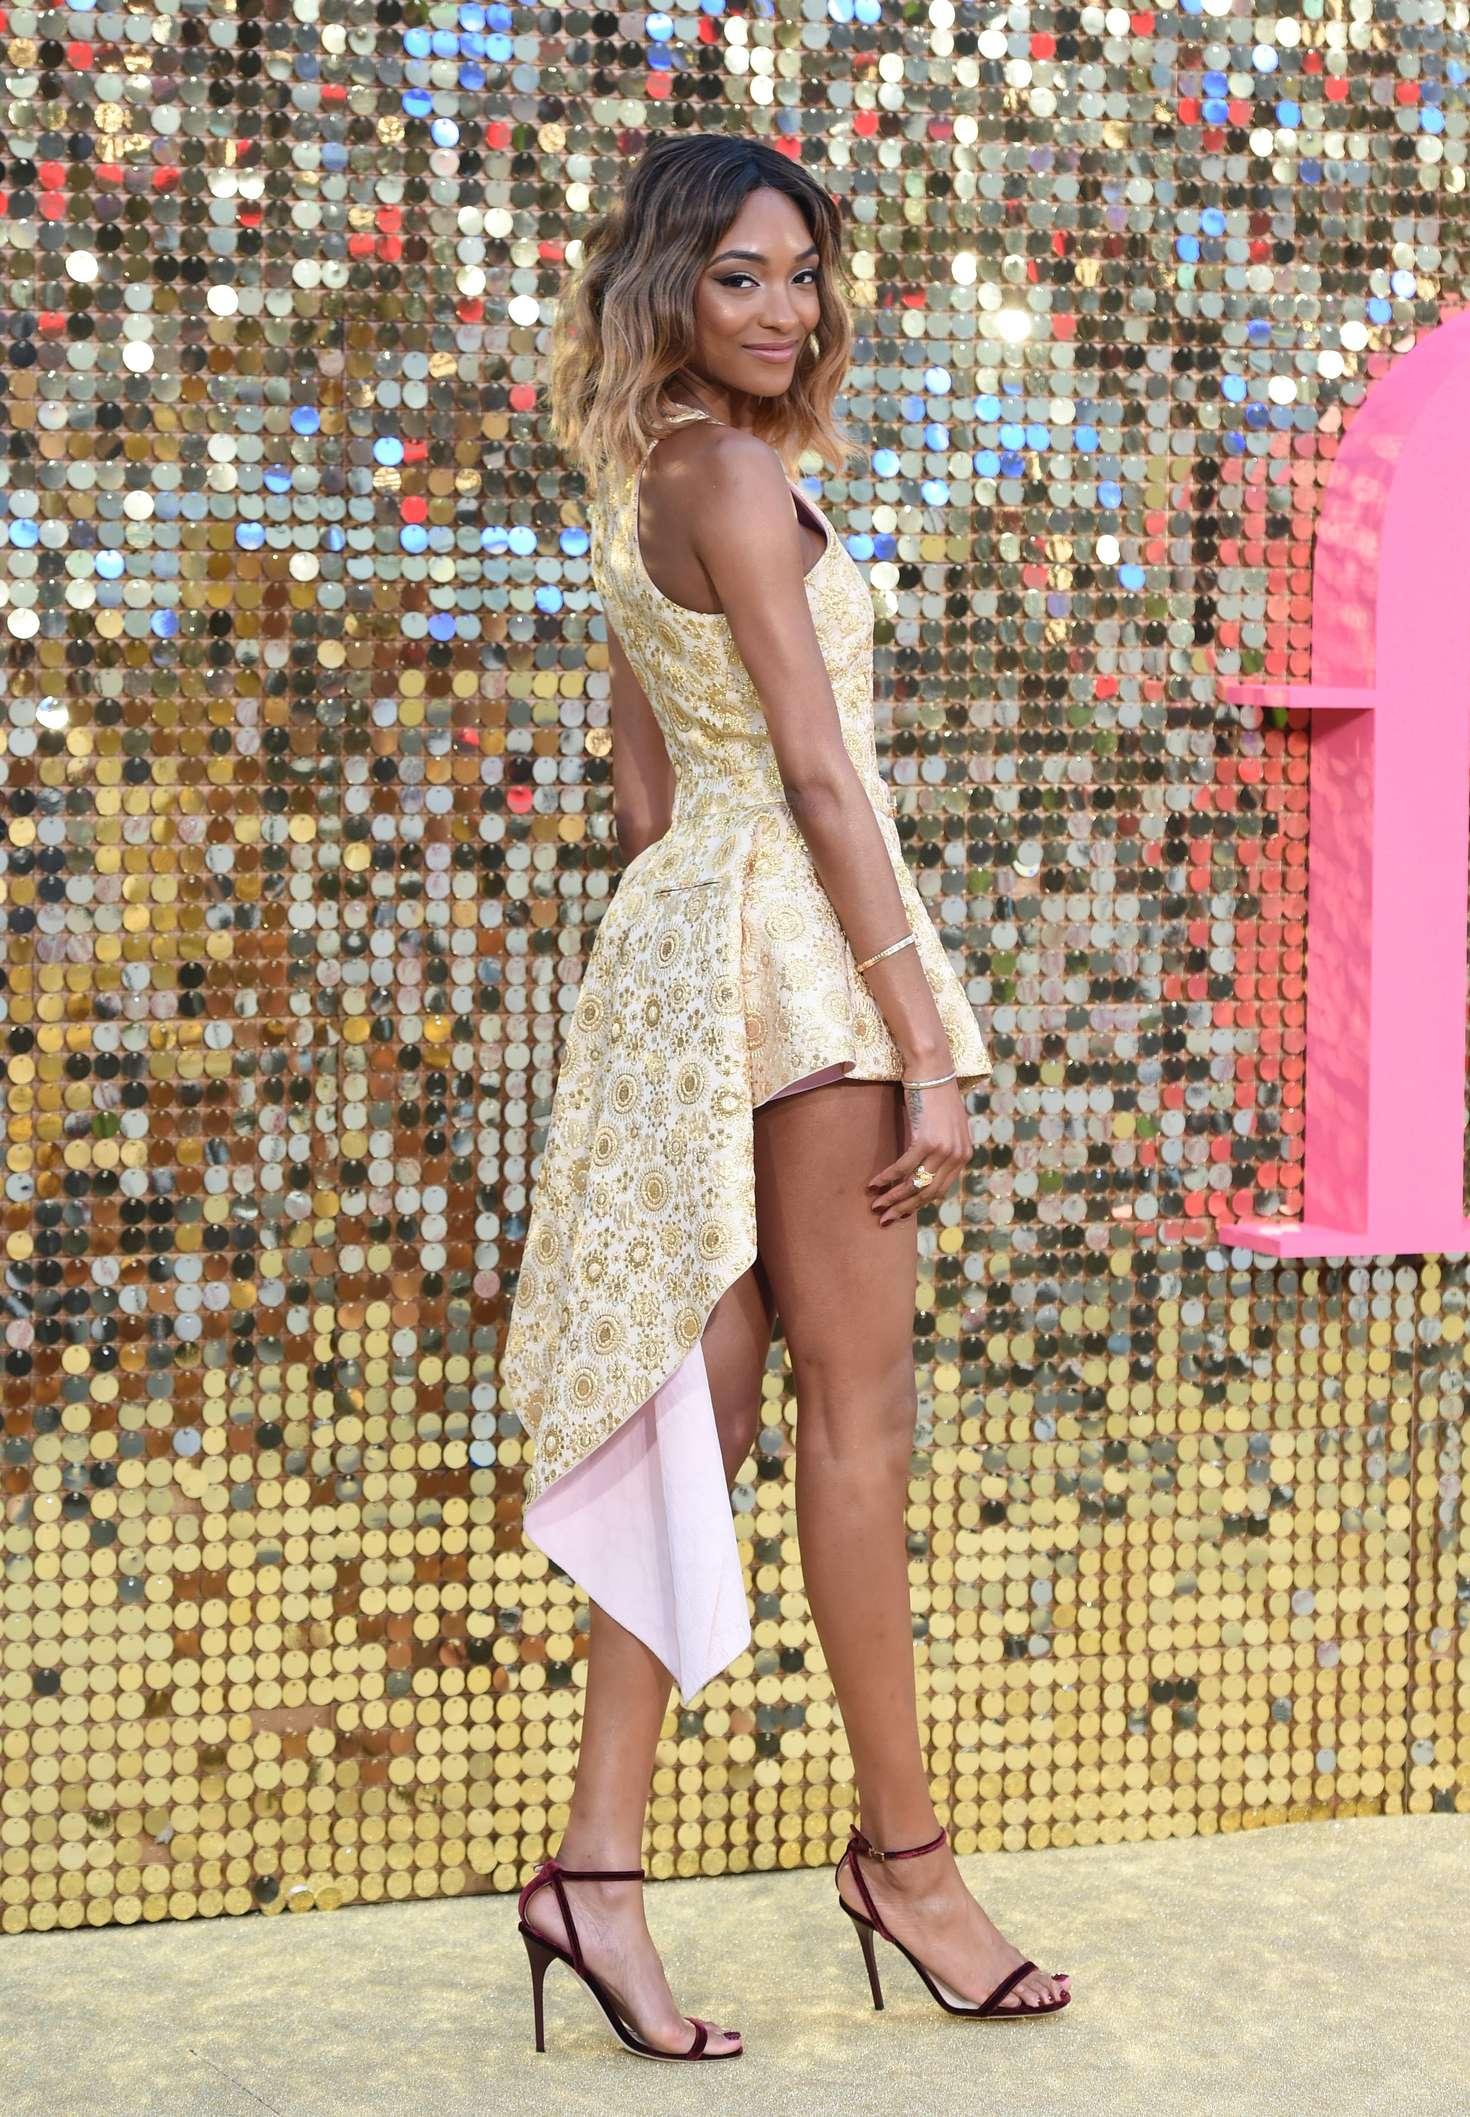 Wallpaper Jourdan Dunn Top Fashion Models 2015 Model: Jourdan Dunn Photo 175 Of 297 Pics, Wallpaper